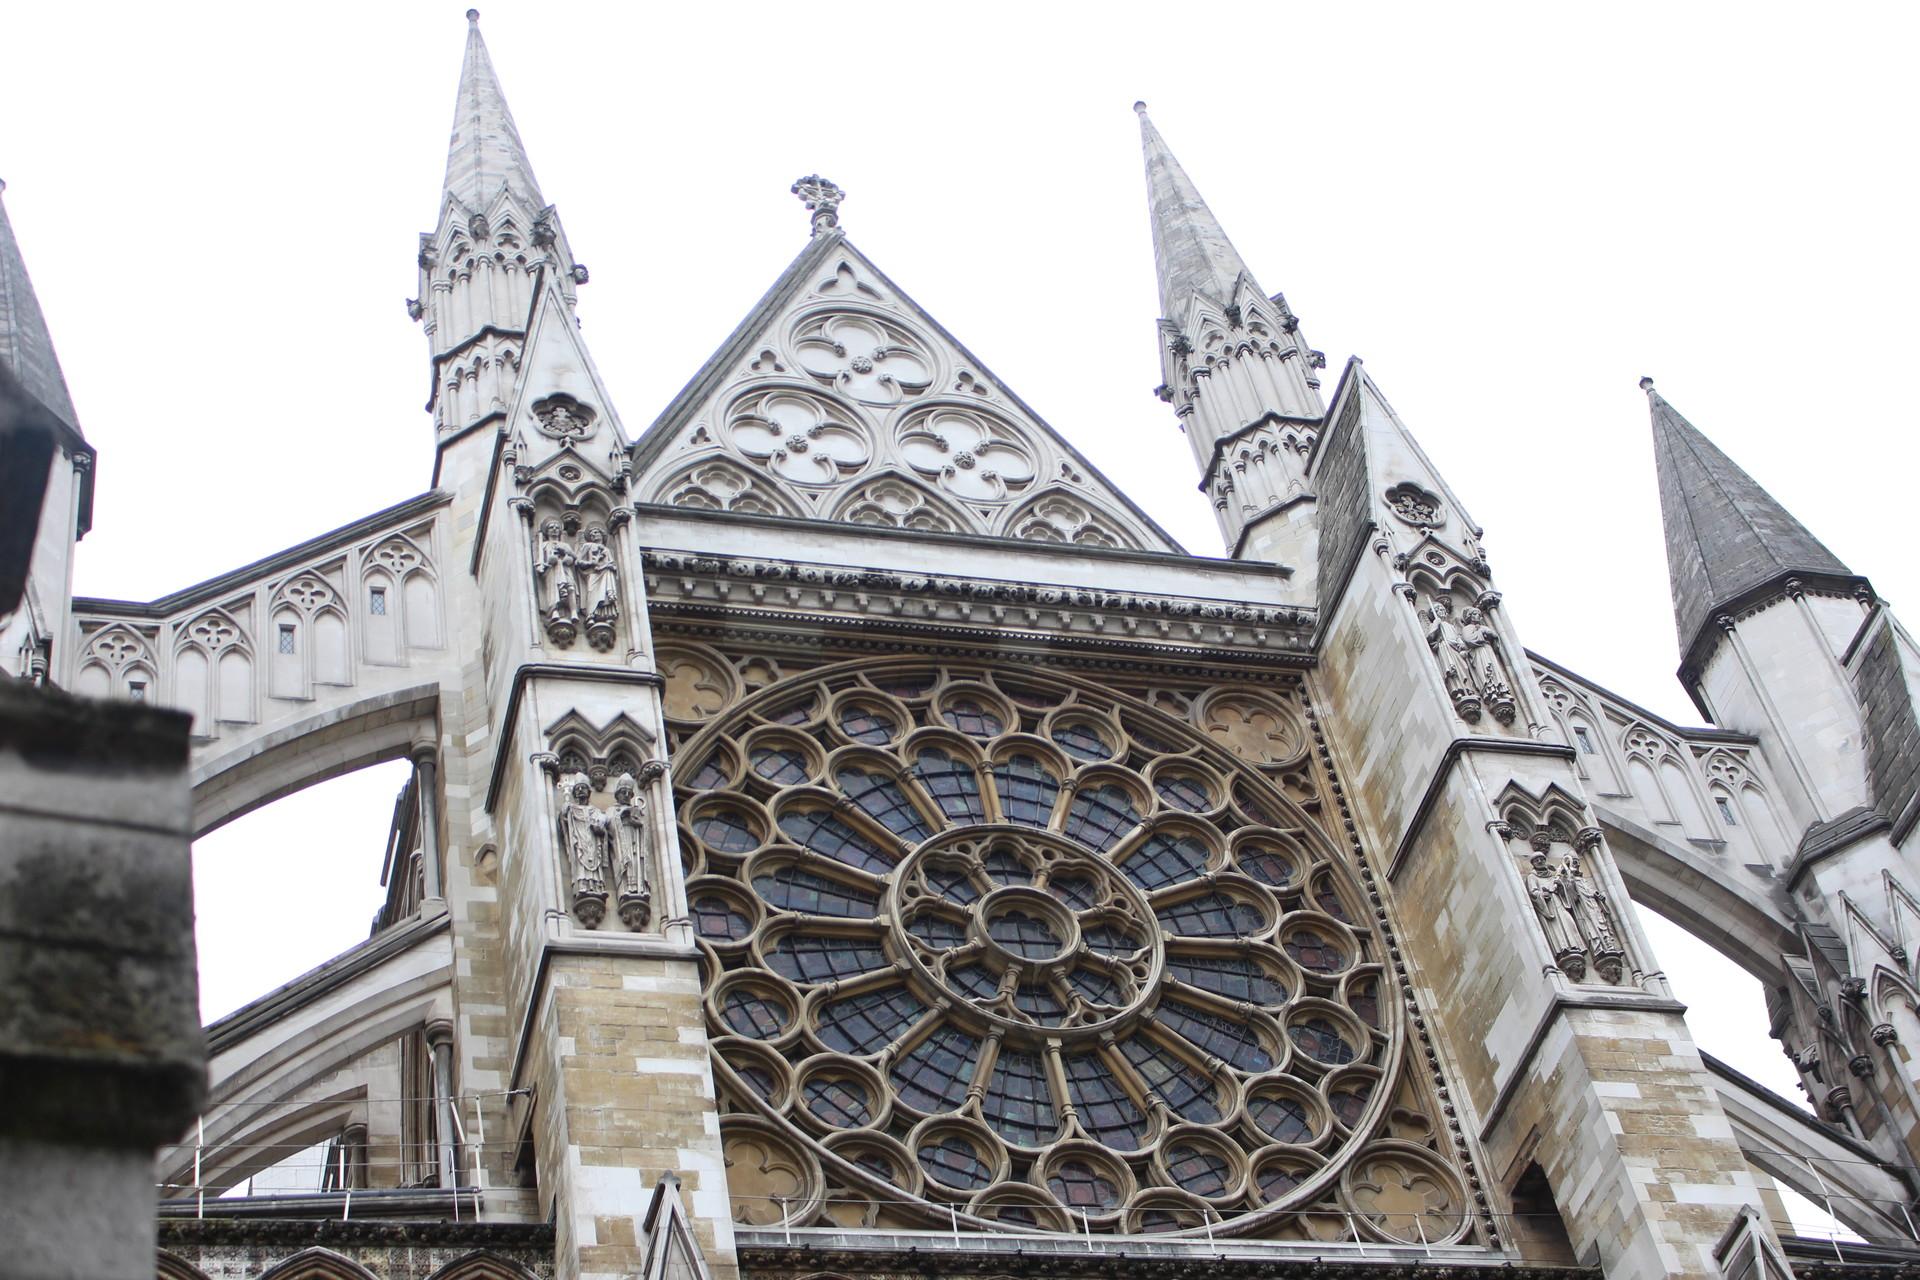 westminster-abbey-63d54b516a48ac5ec00bc2